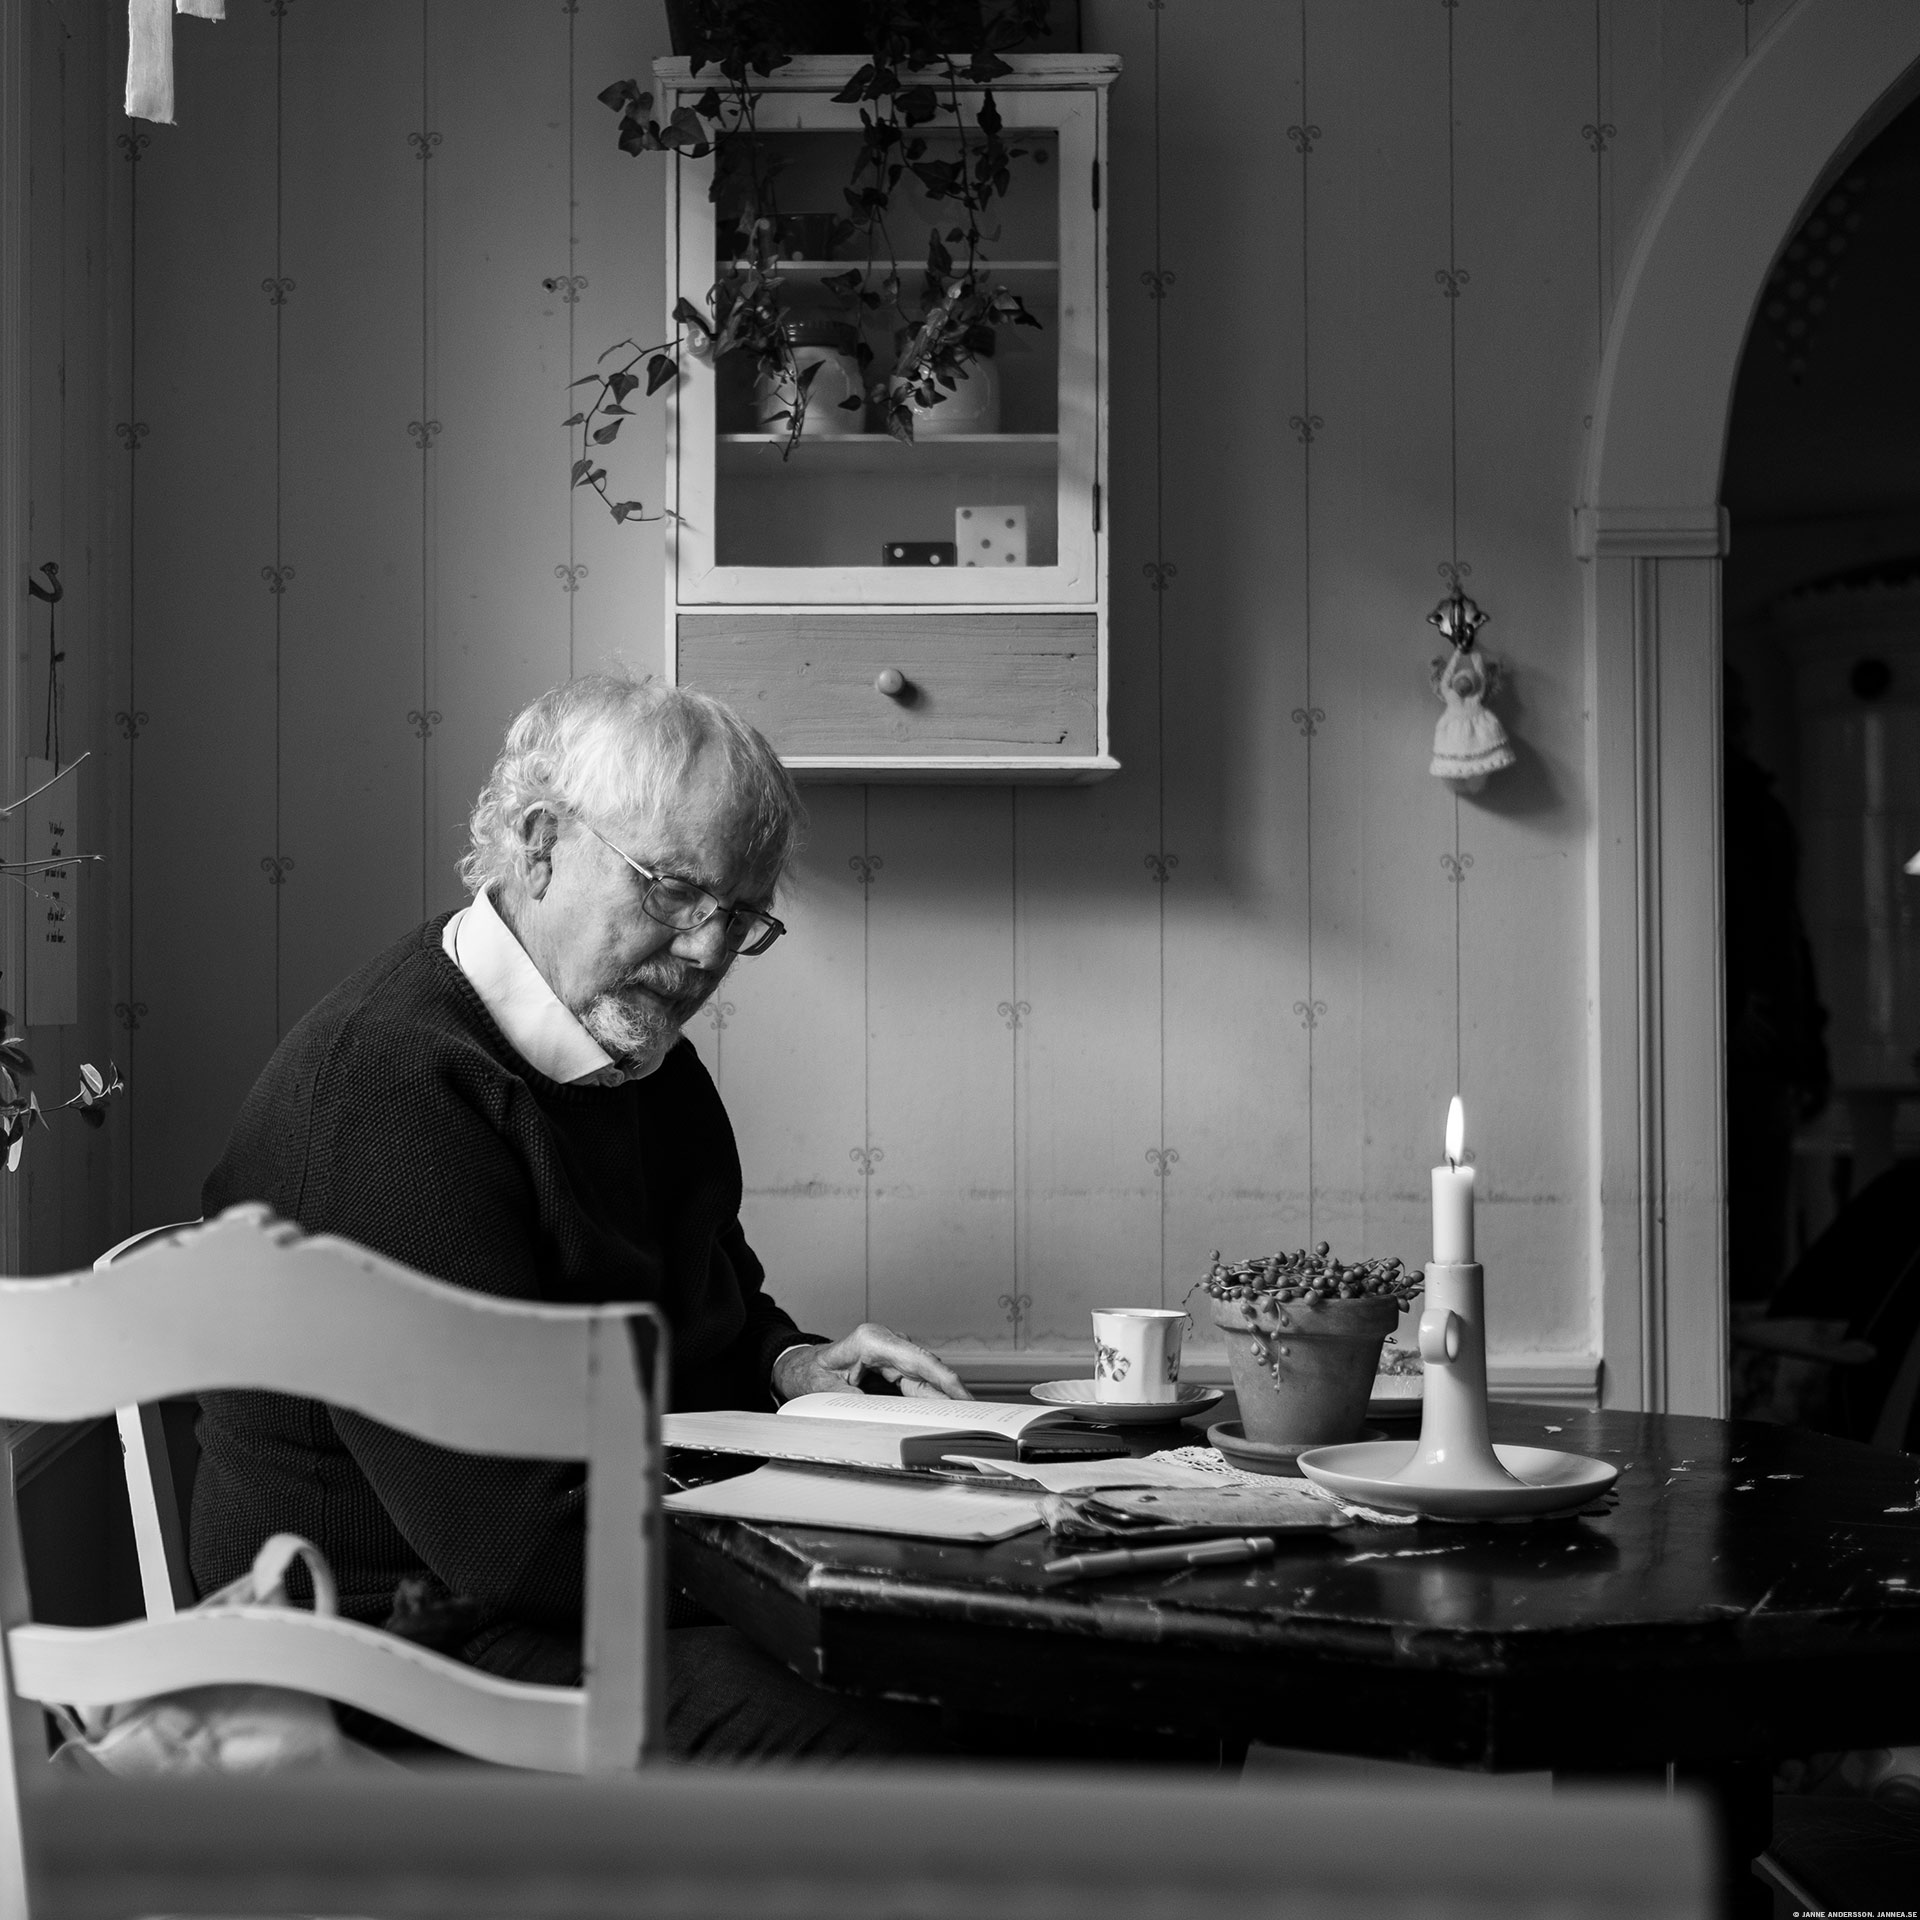 Farbror läser bok på GK |© Janne A